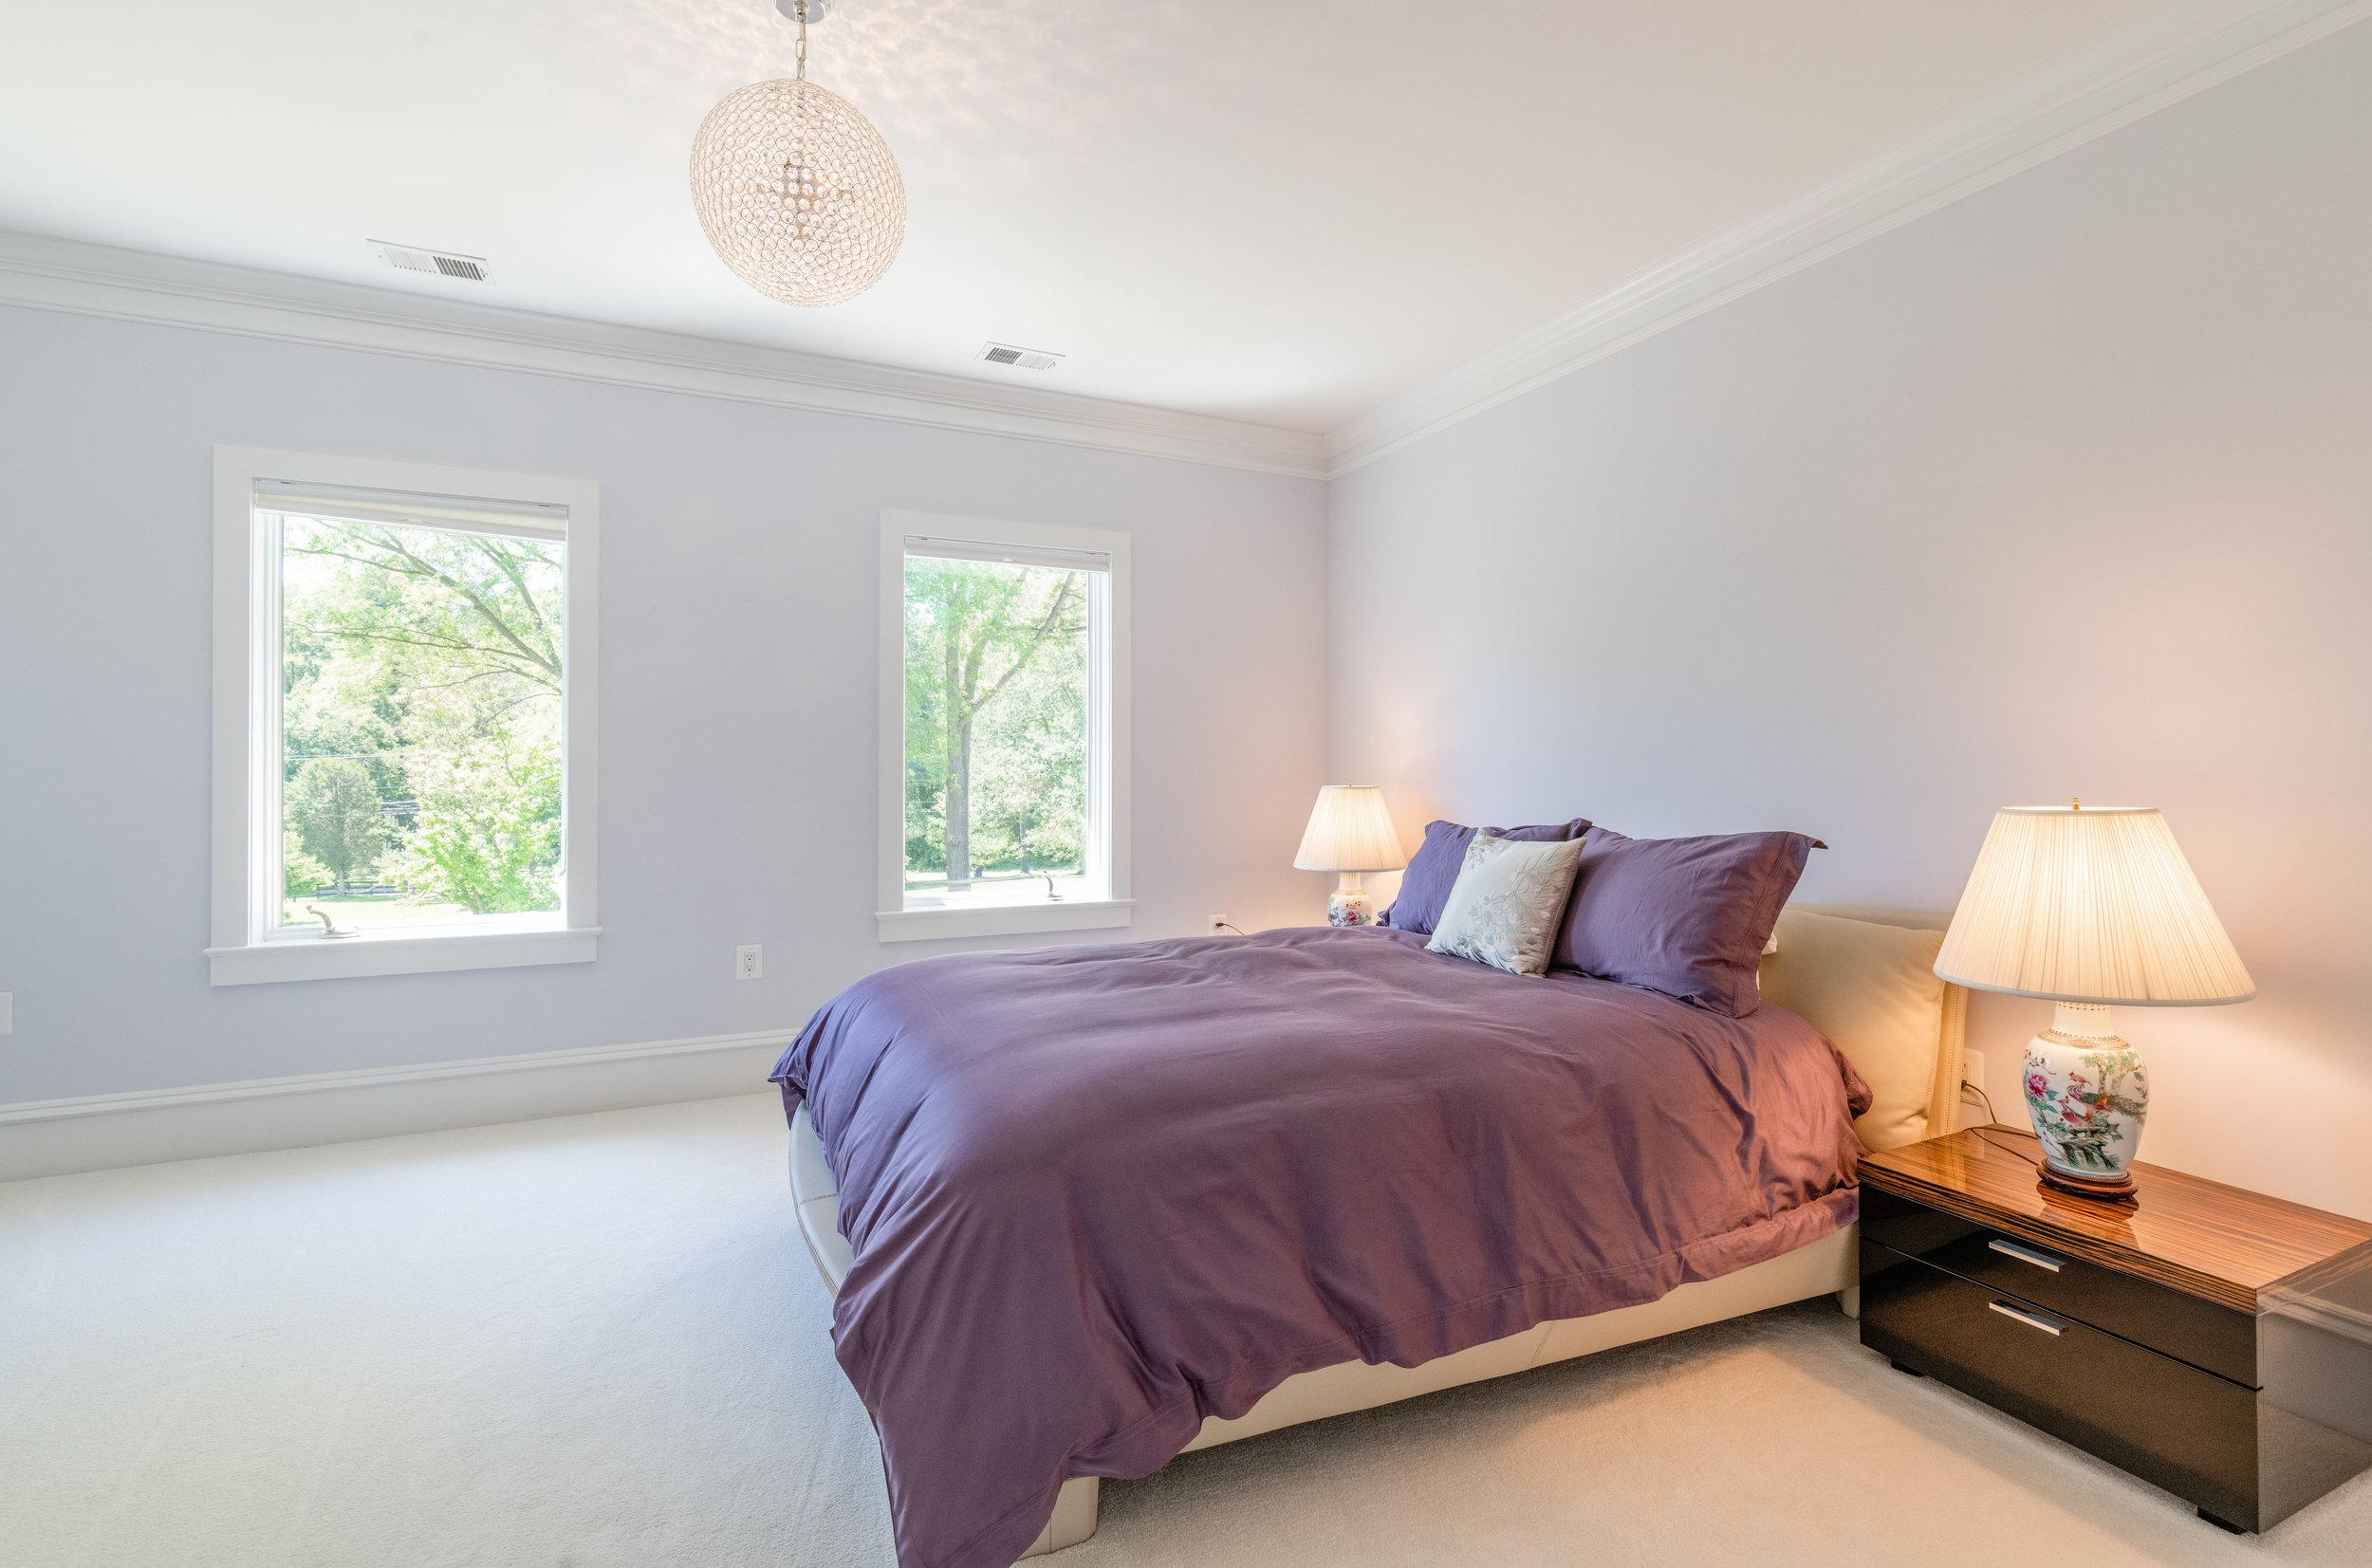 Bedroom Three with Walk-in Closet and En Suite Bathroom